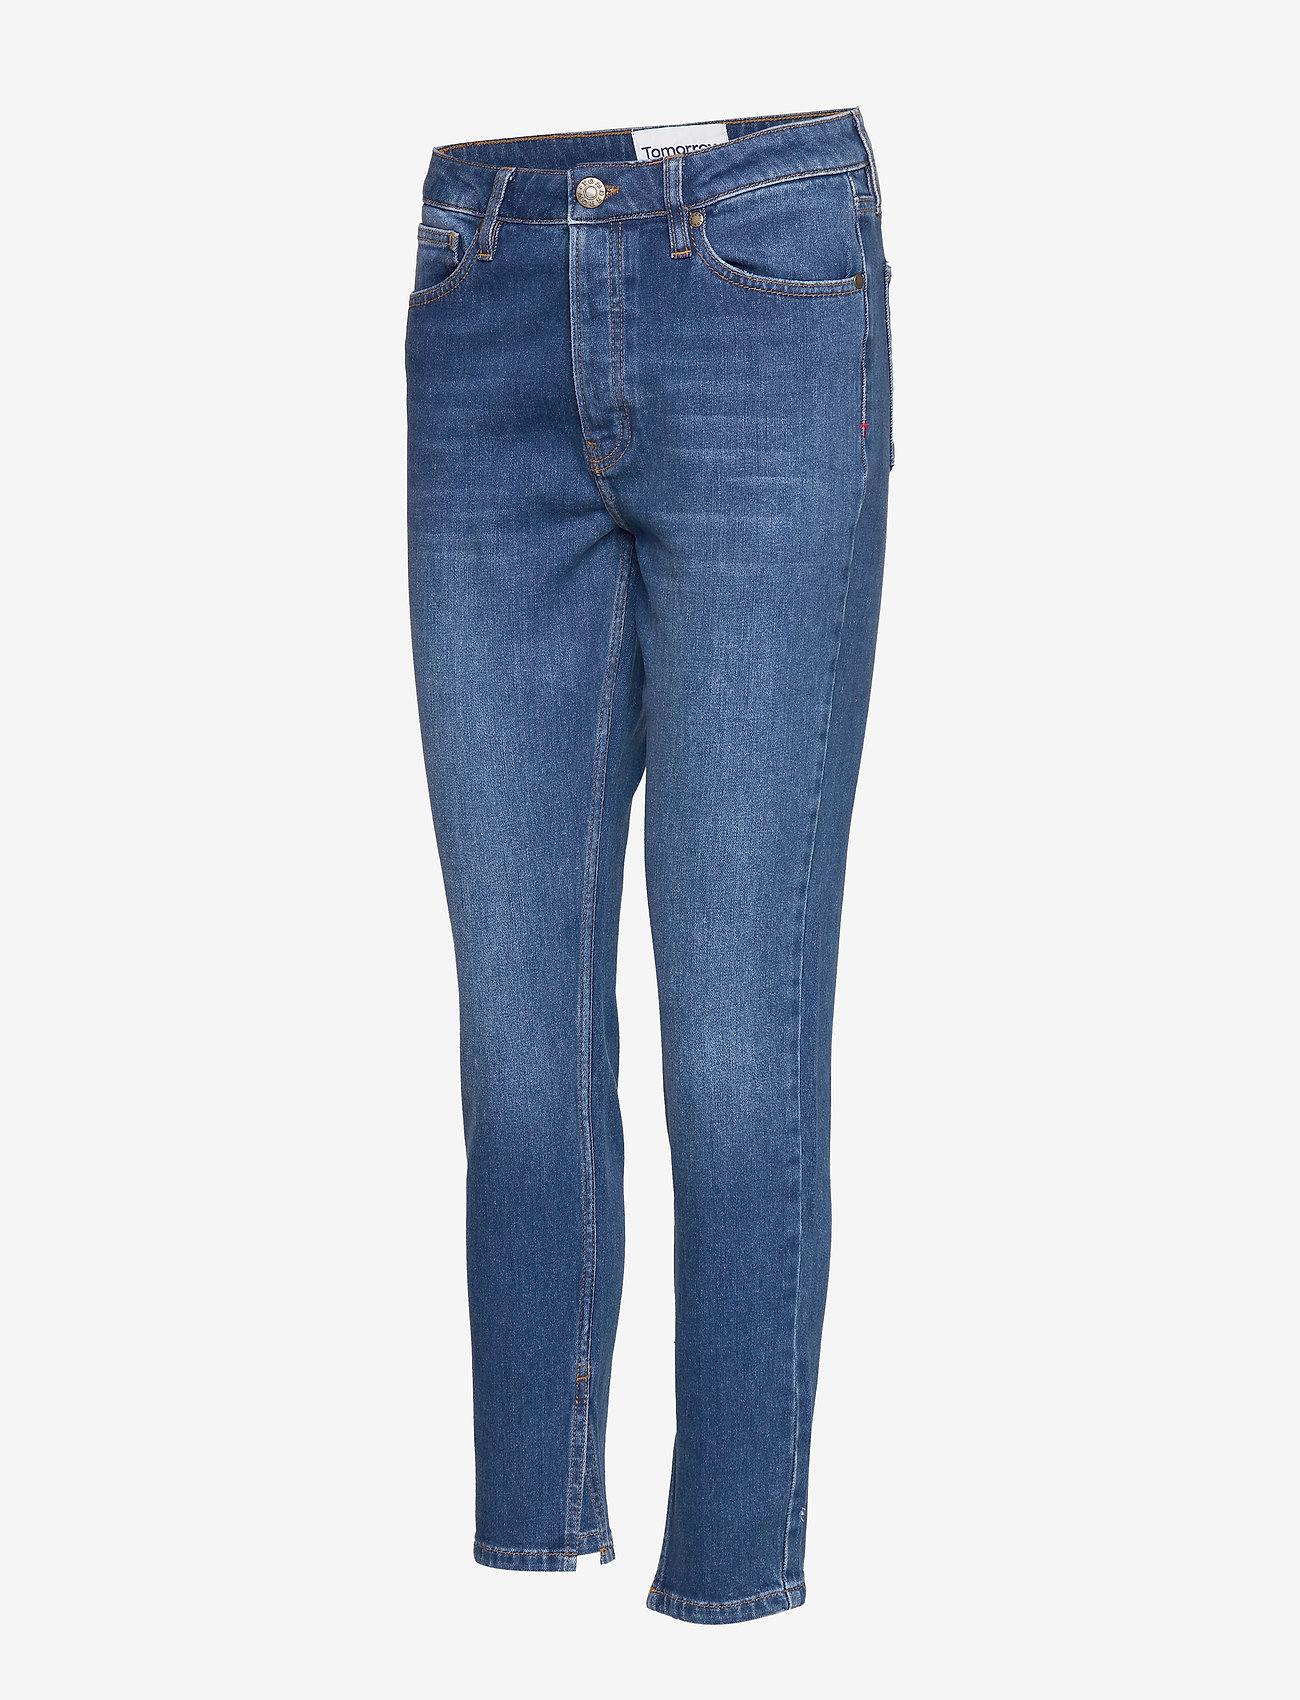 Tomorrow Hepburn Hw Mom Wash Bilbao - Jeans Denim Blue